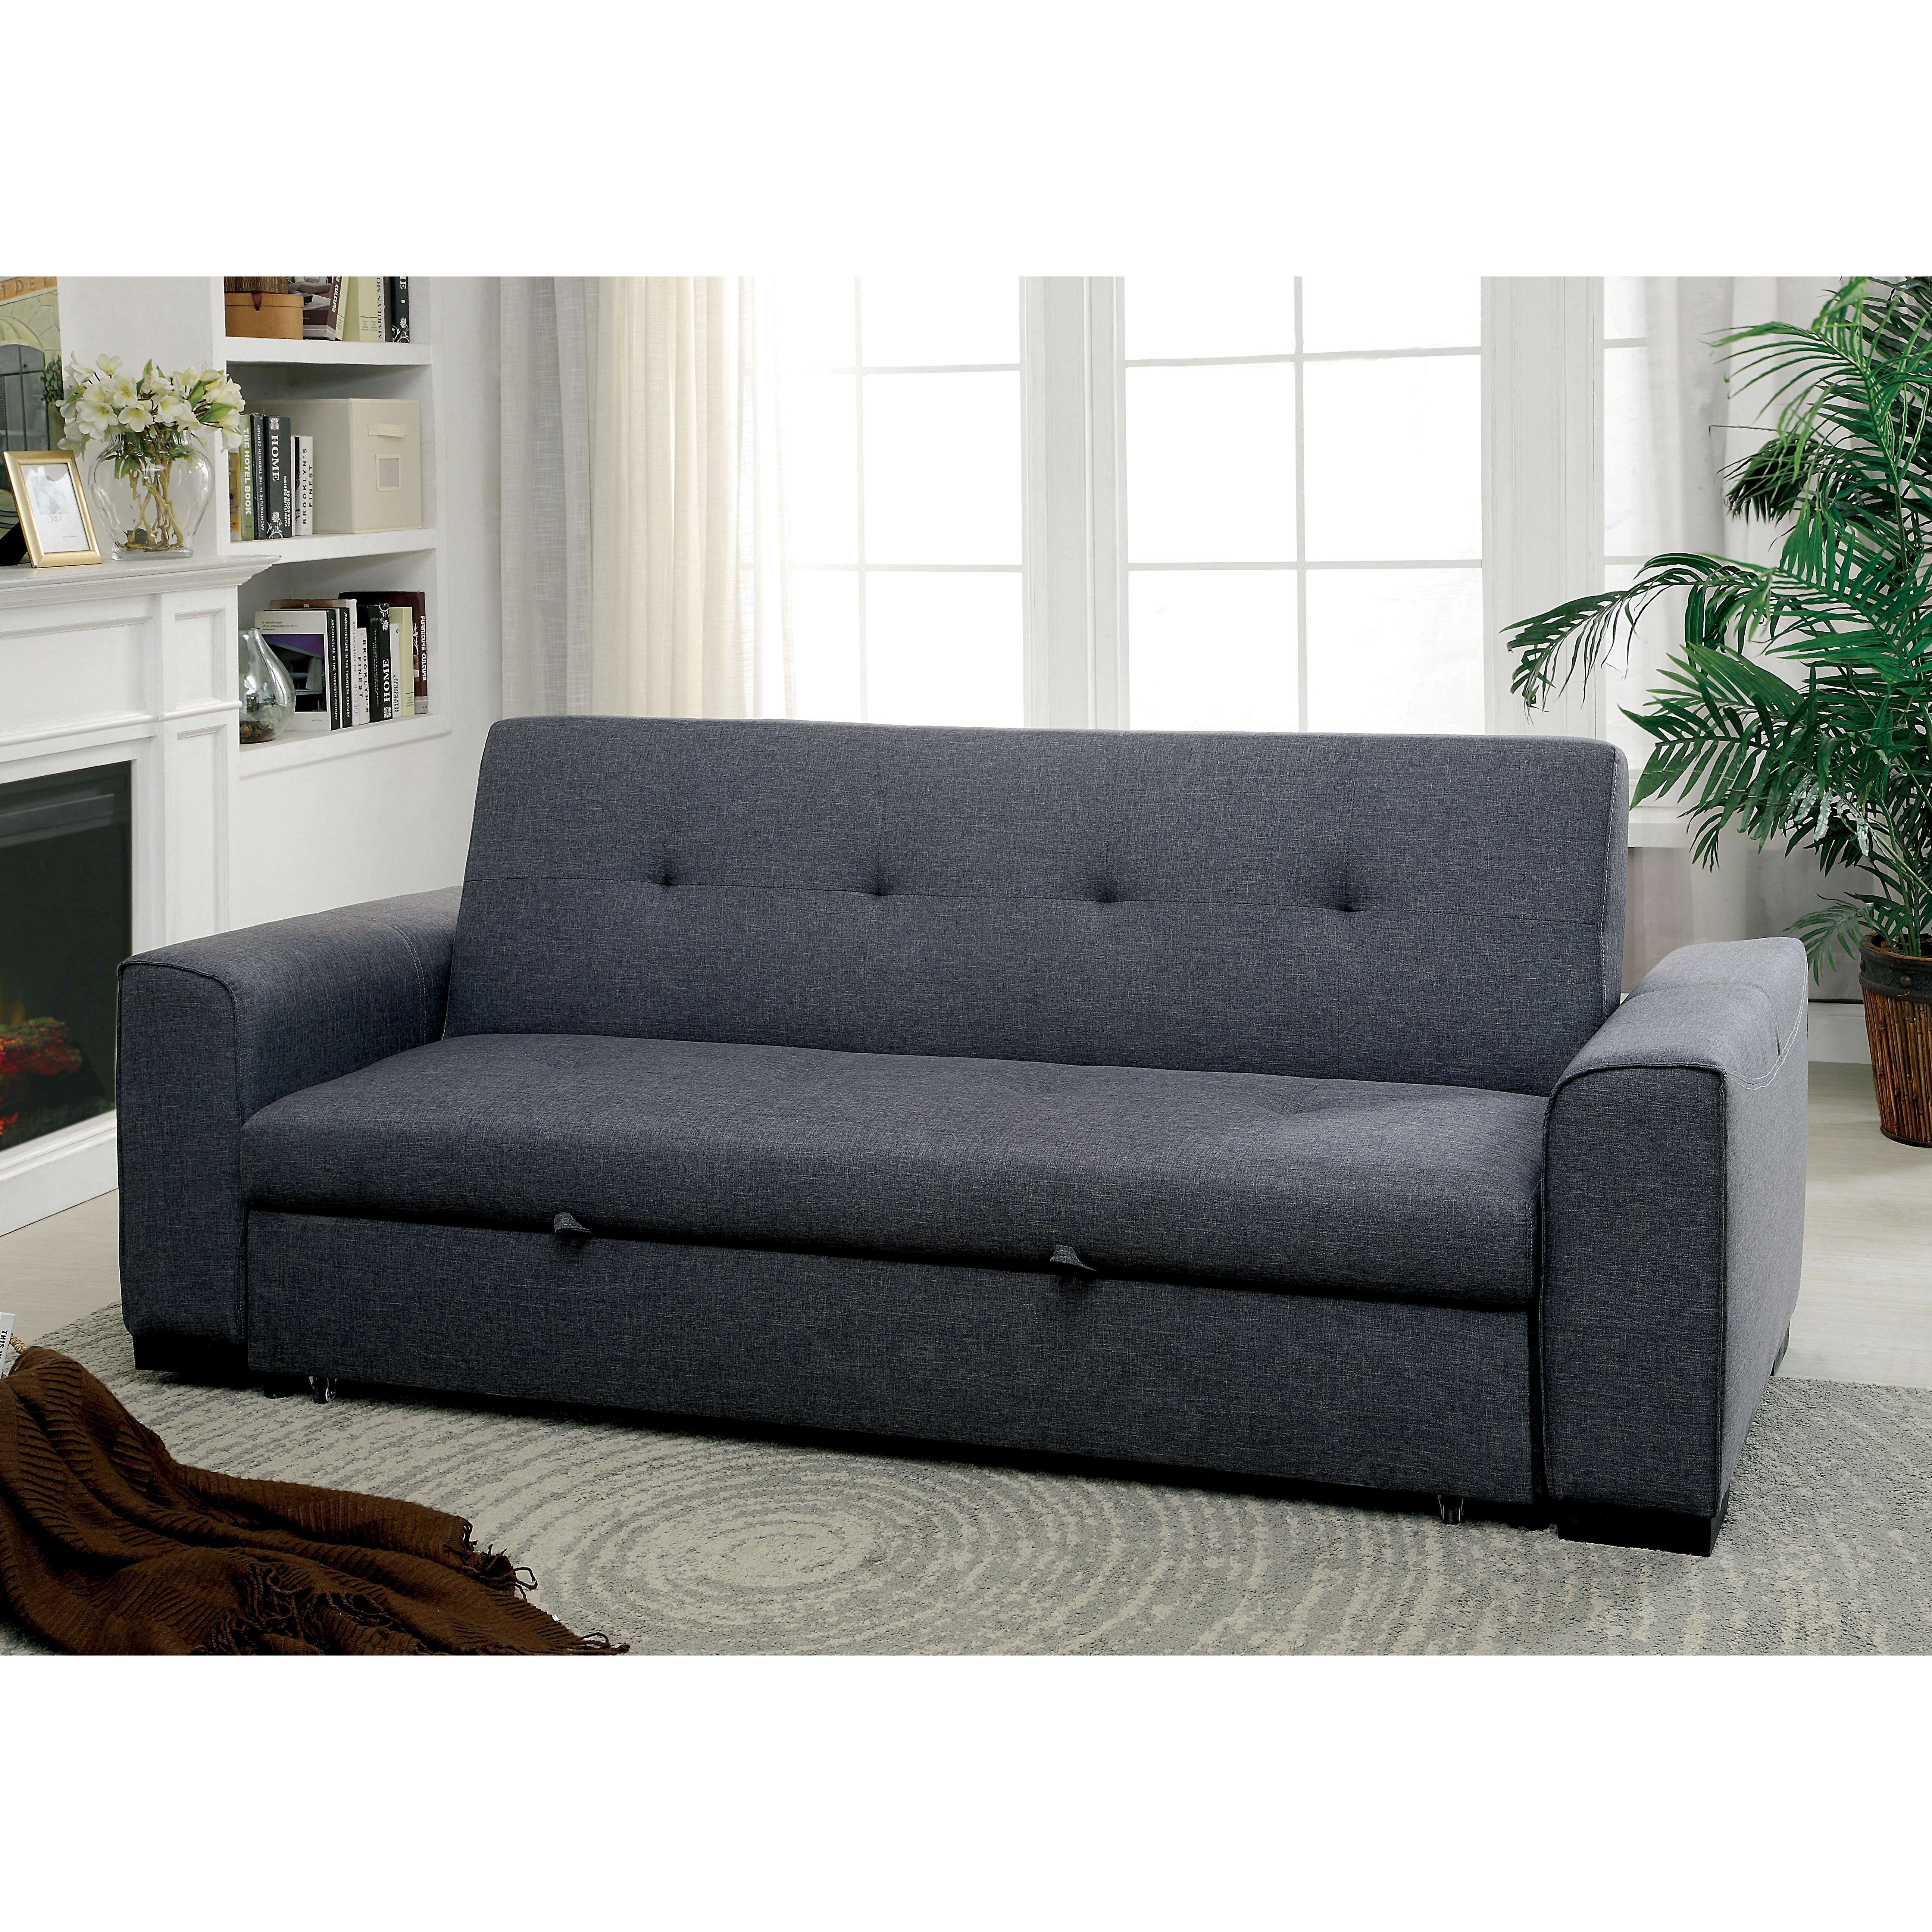 Randy Pull Out Sleeper Futon Convertible Sofa Wayfair